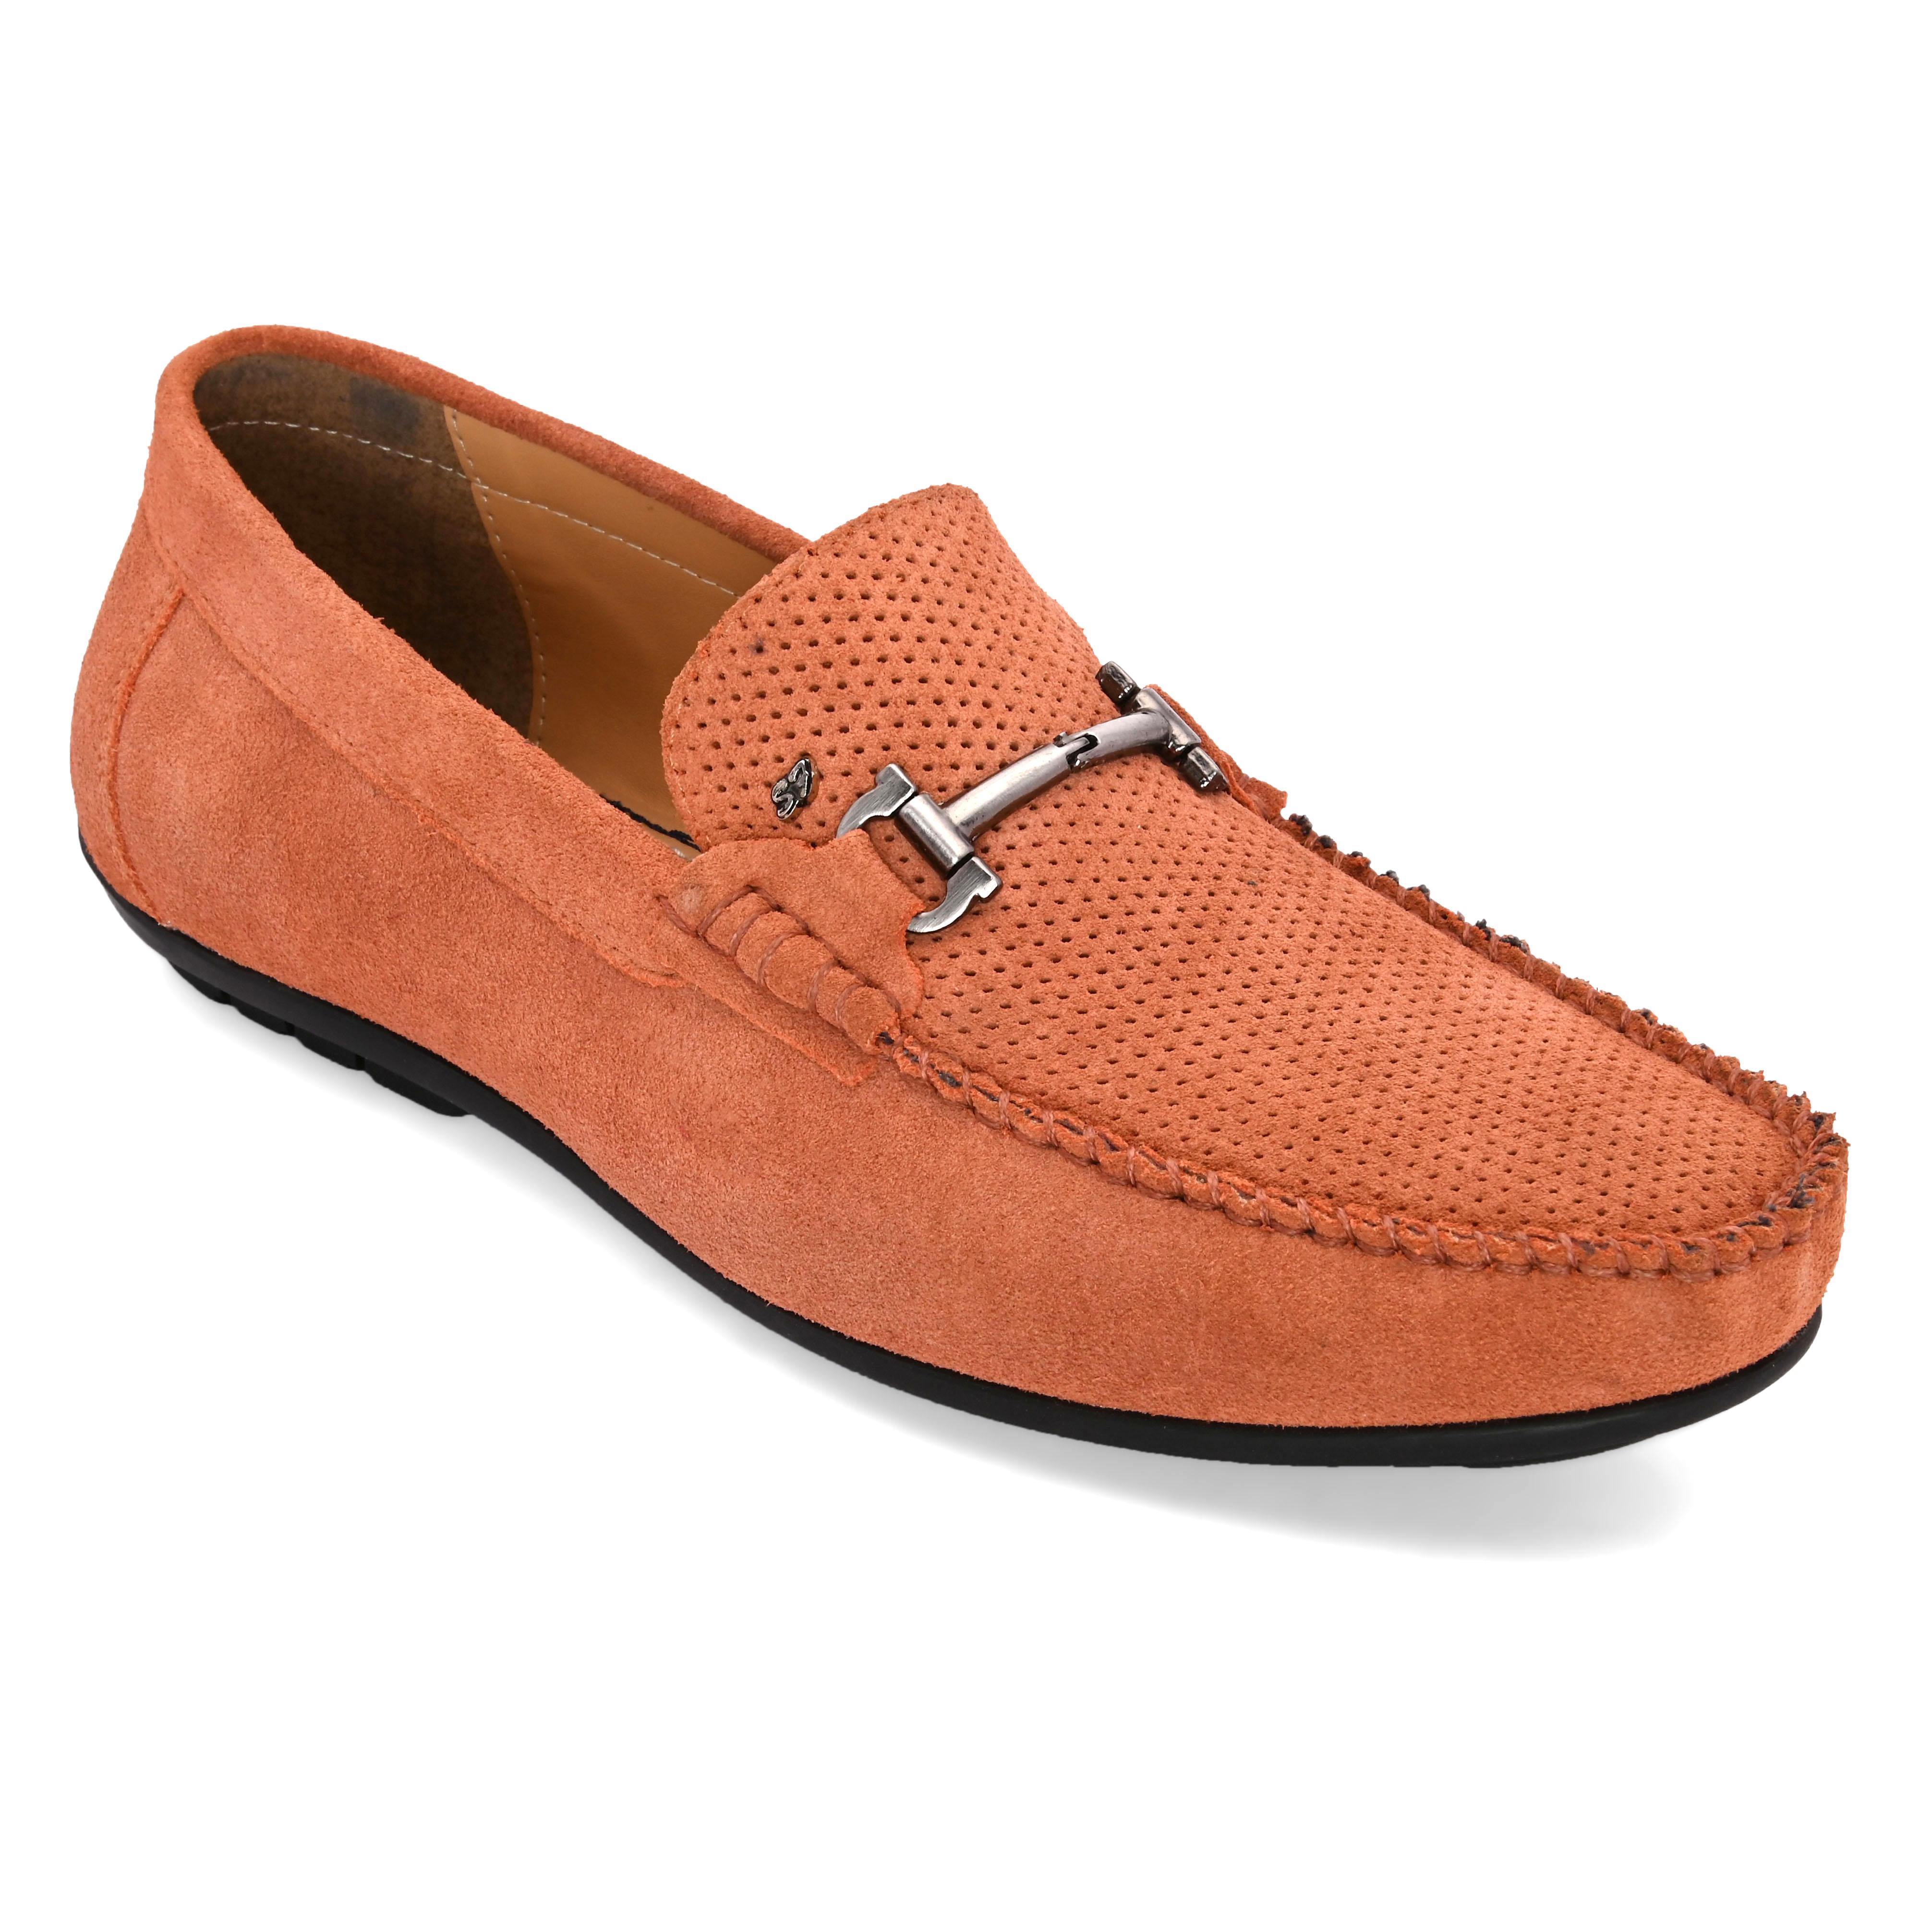 San Frissco | San Frissco Men Genuine leather Stitch Peach Loafers